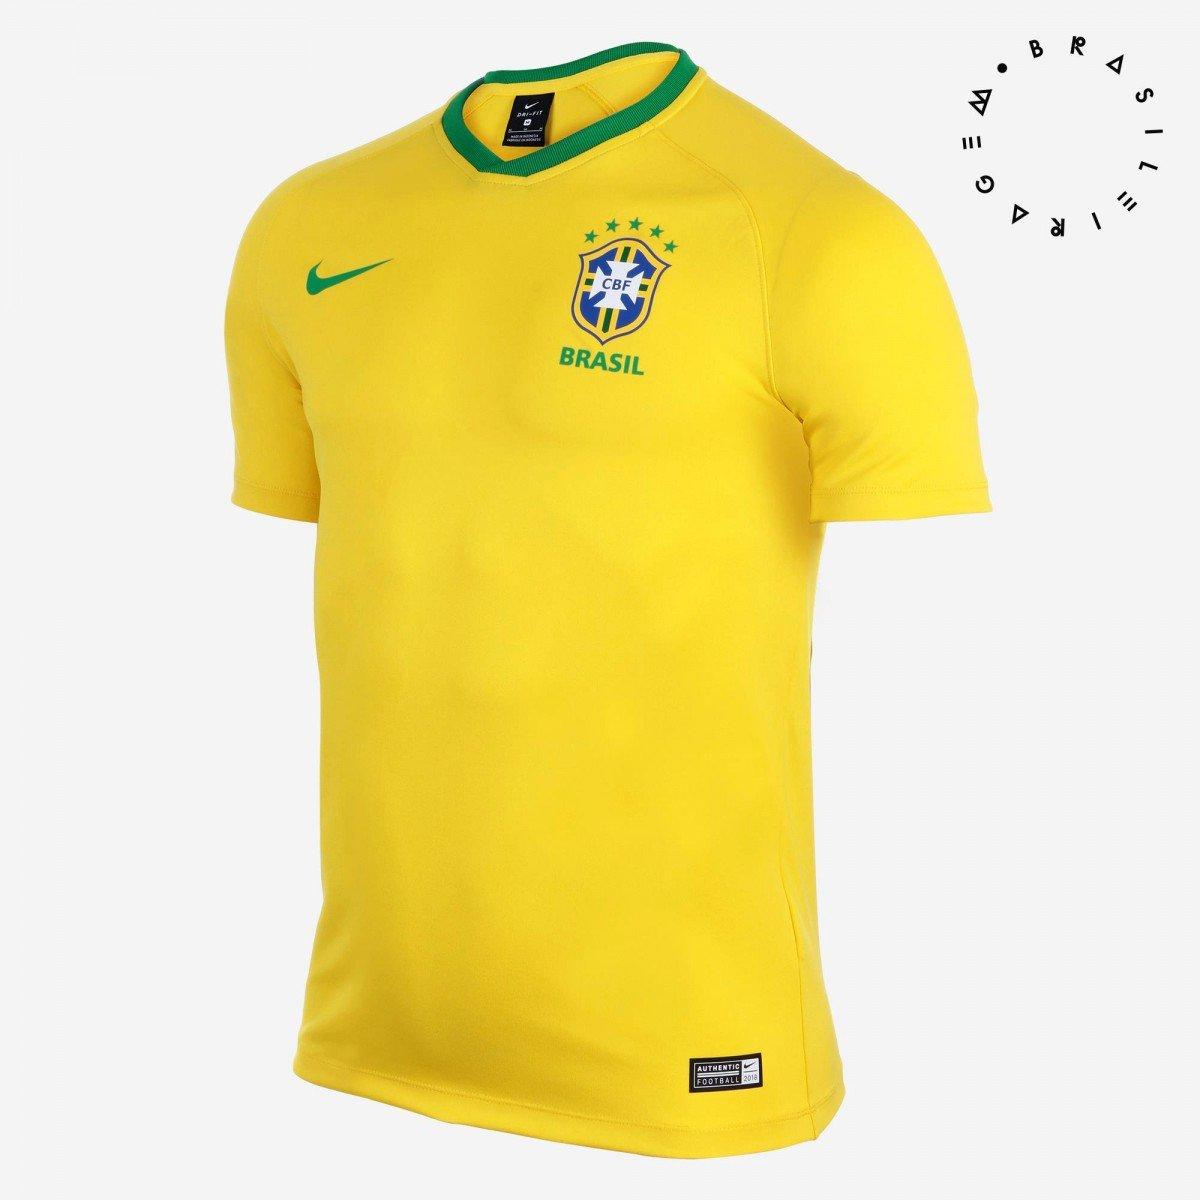 4037922144 Camisa Nike Brasil I 2018 19 Torcedor Estádio Masculina - Compre ...